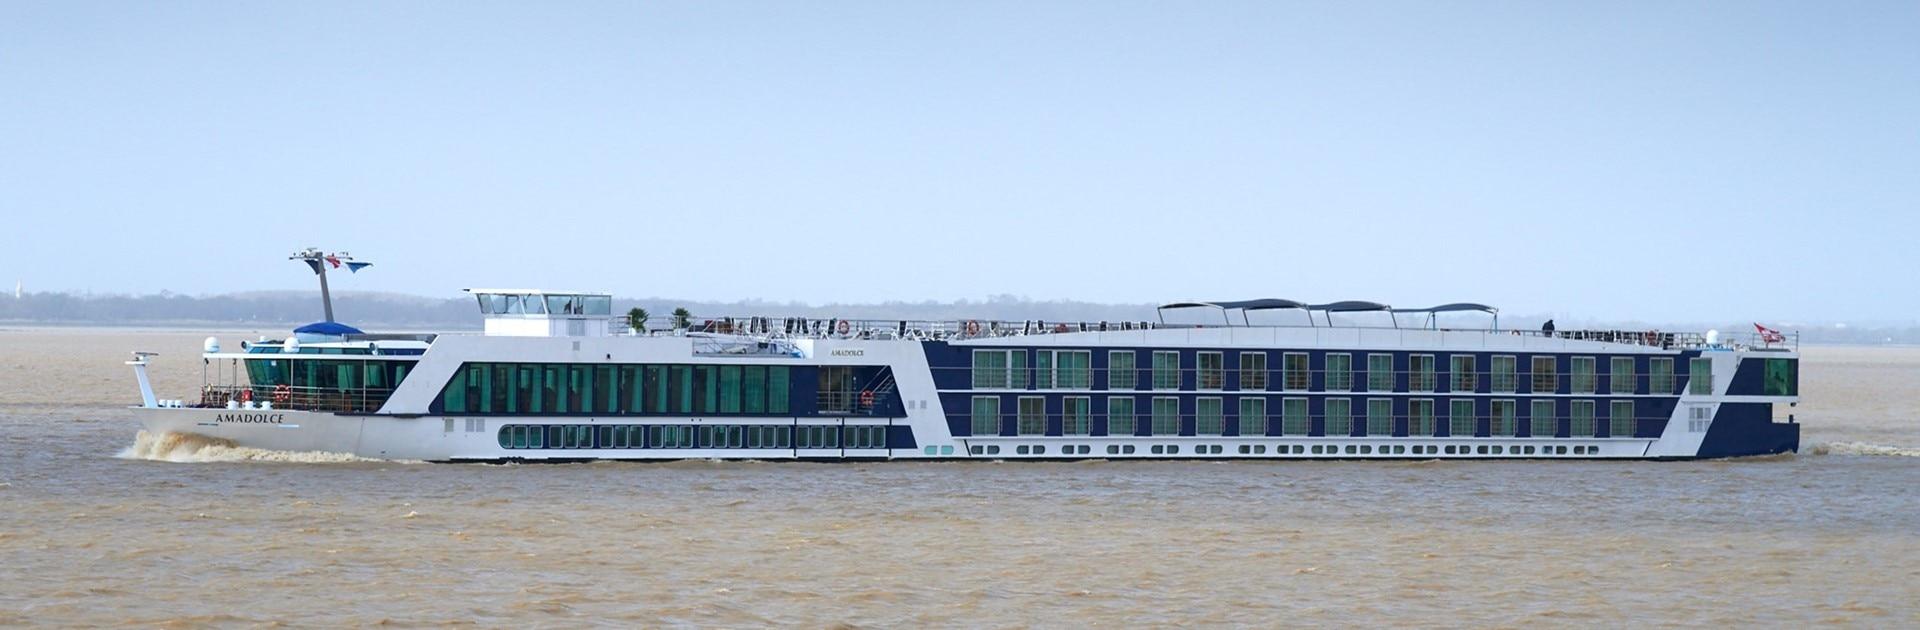 River Cruise Lines Europe Asia Africa AmaWaterways UK - River cruise ships europe